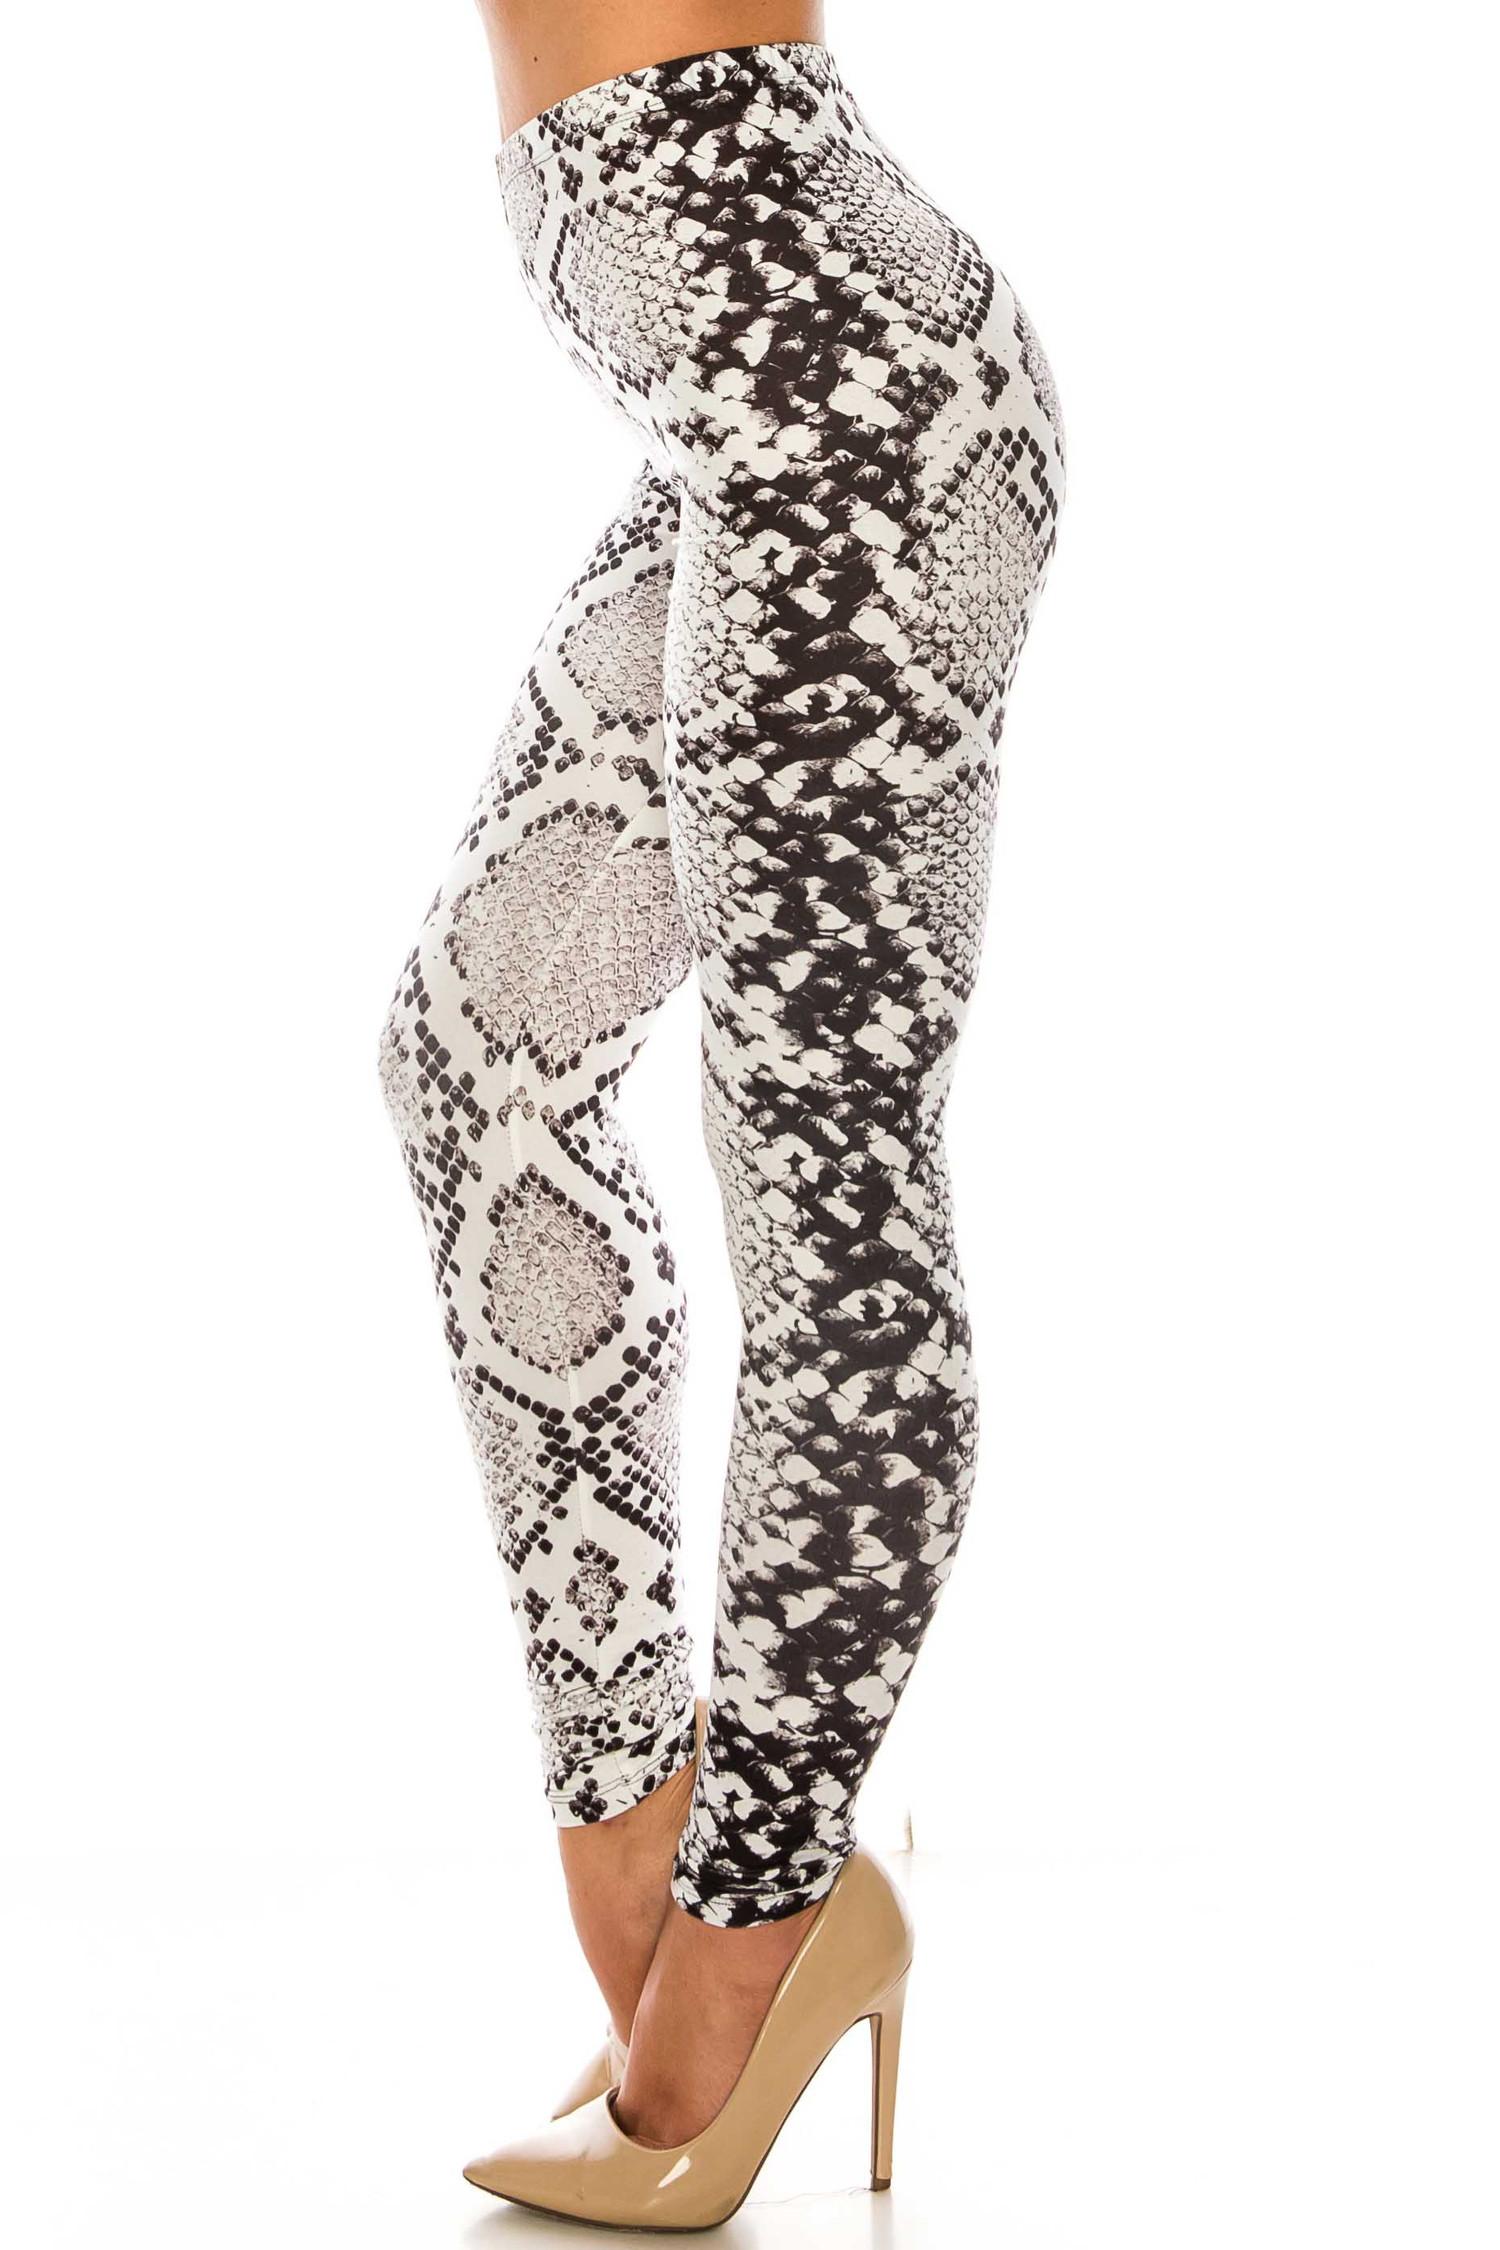 Creamy Soft Ivory Python Extra Plus Size Leggings - 3X-5X - USA Fashion™